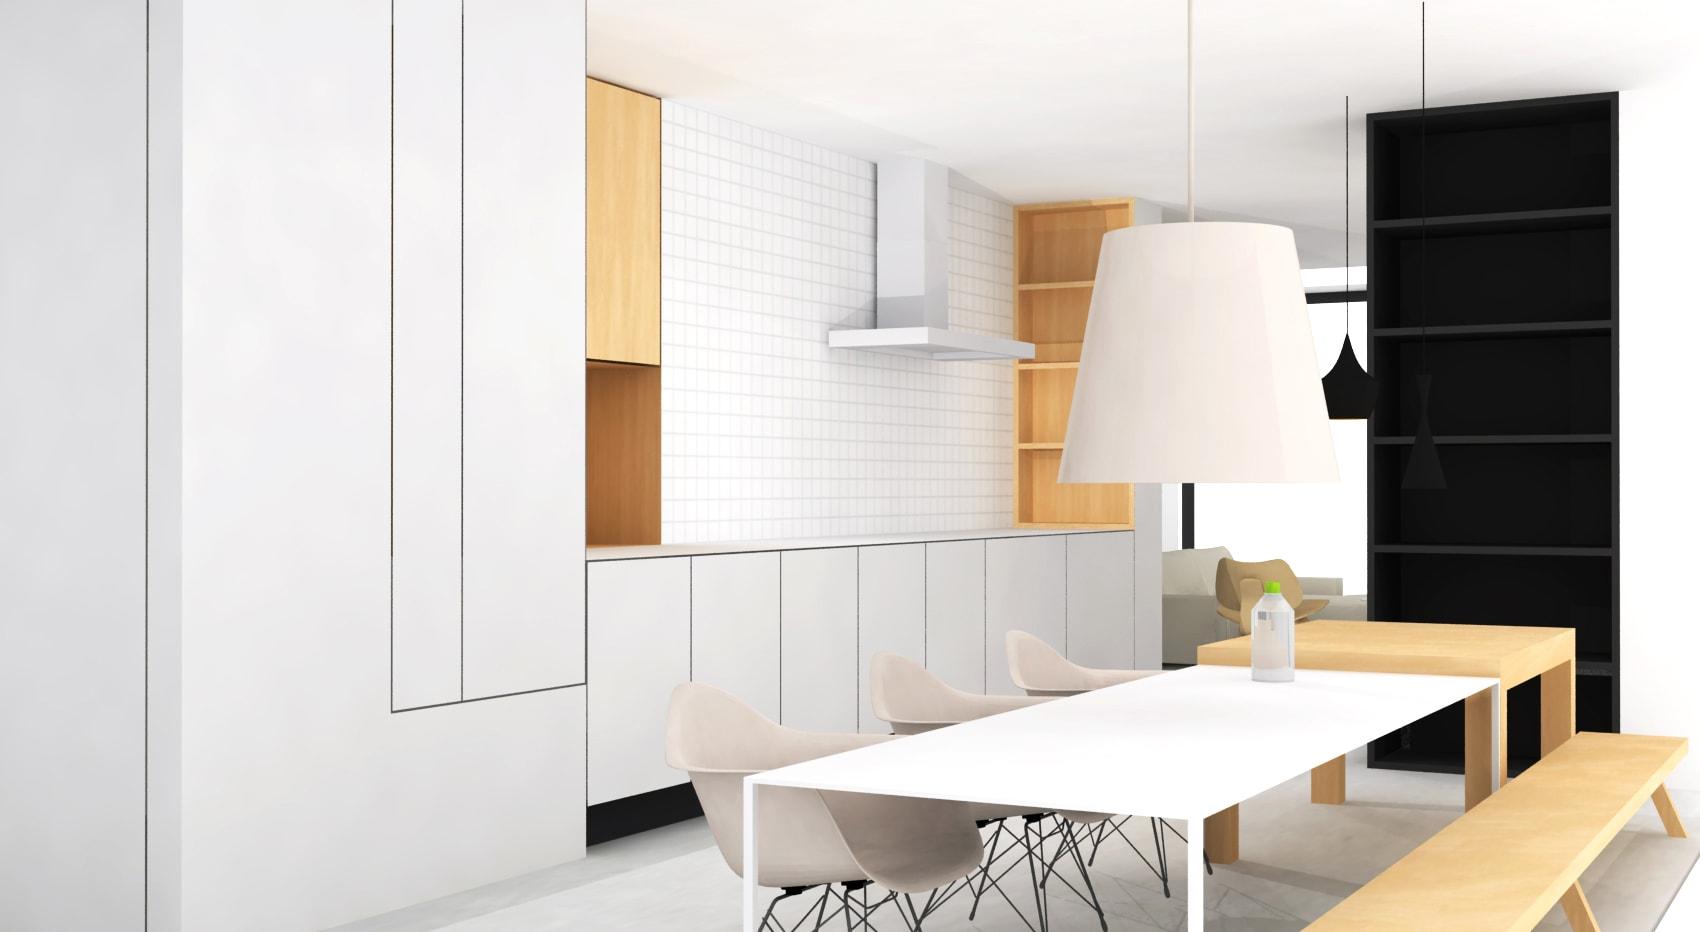 Moderne witte rechte keuken met vierkante tegels zonder bovenkastjes